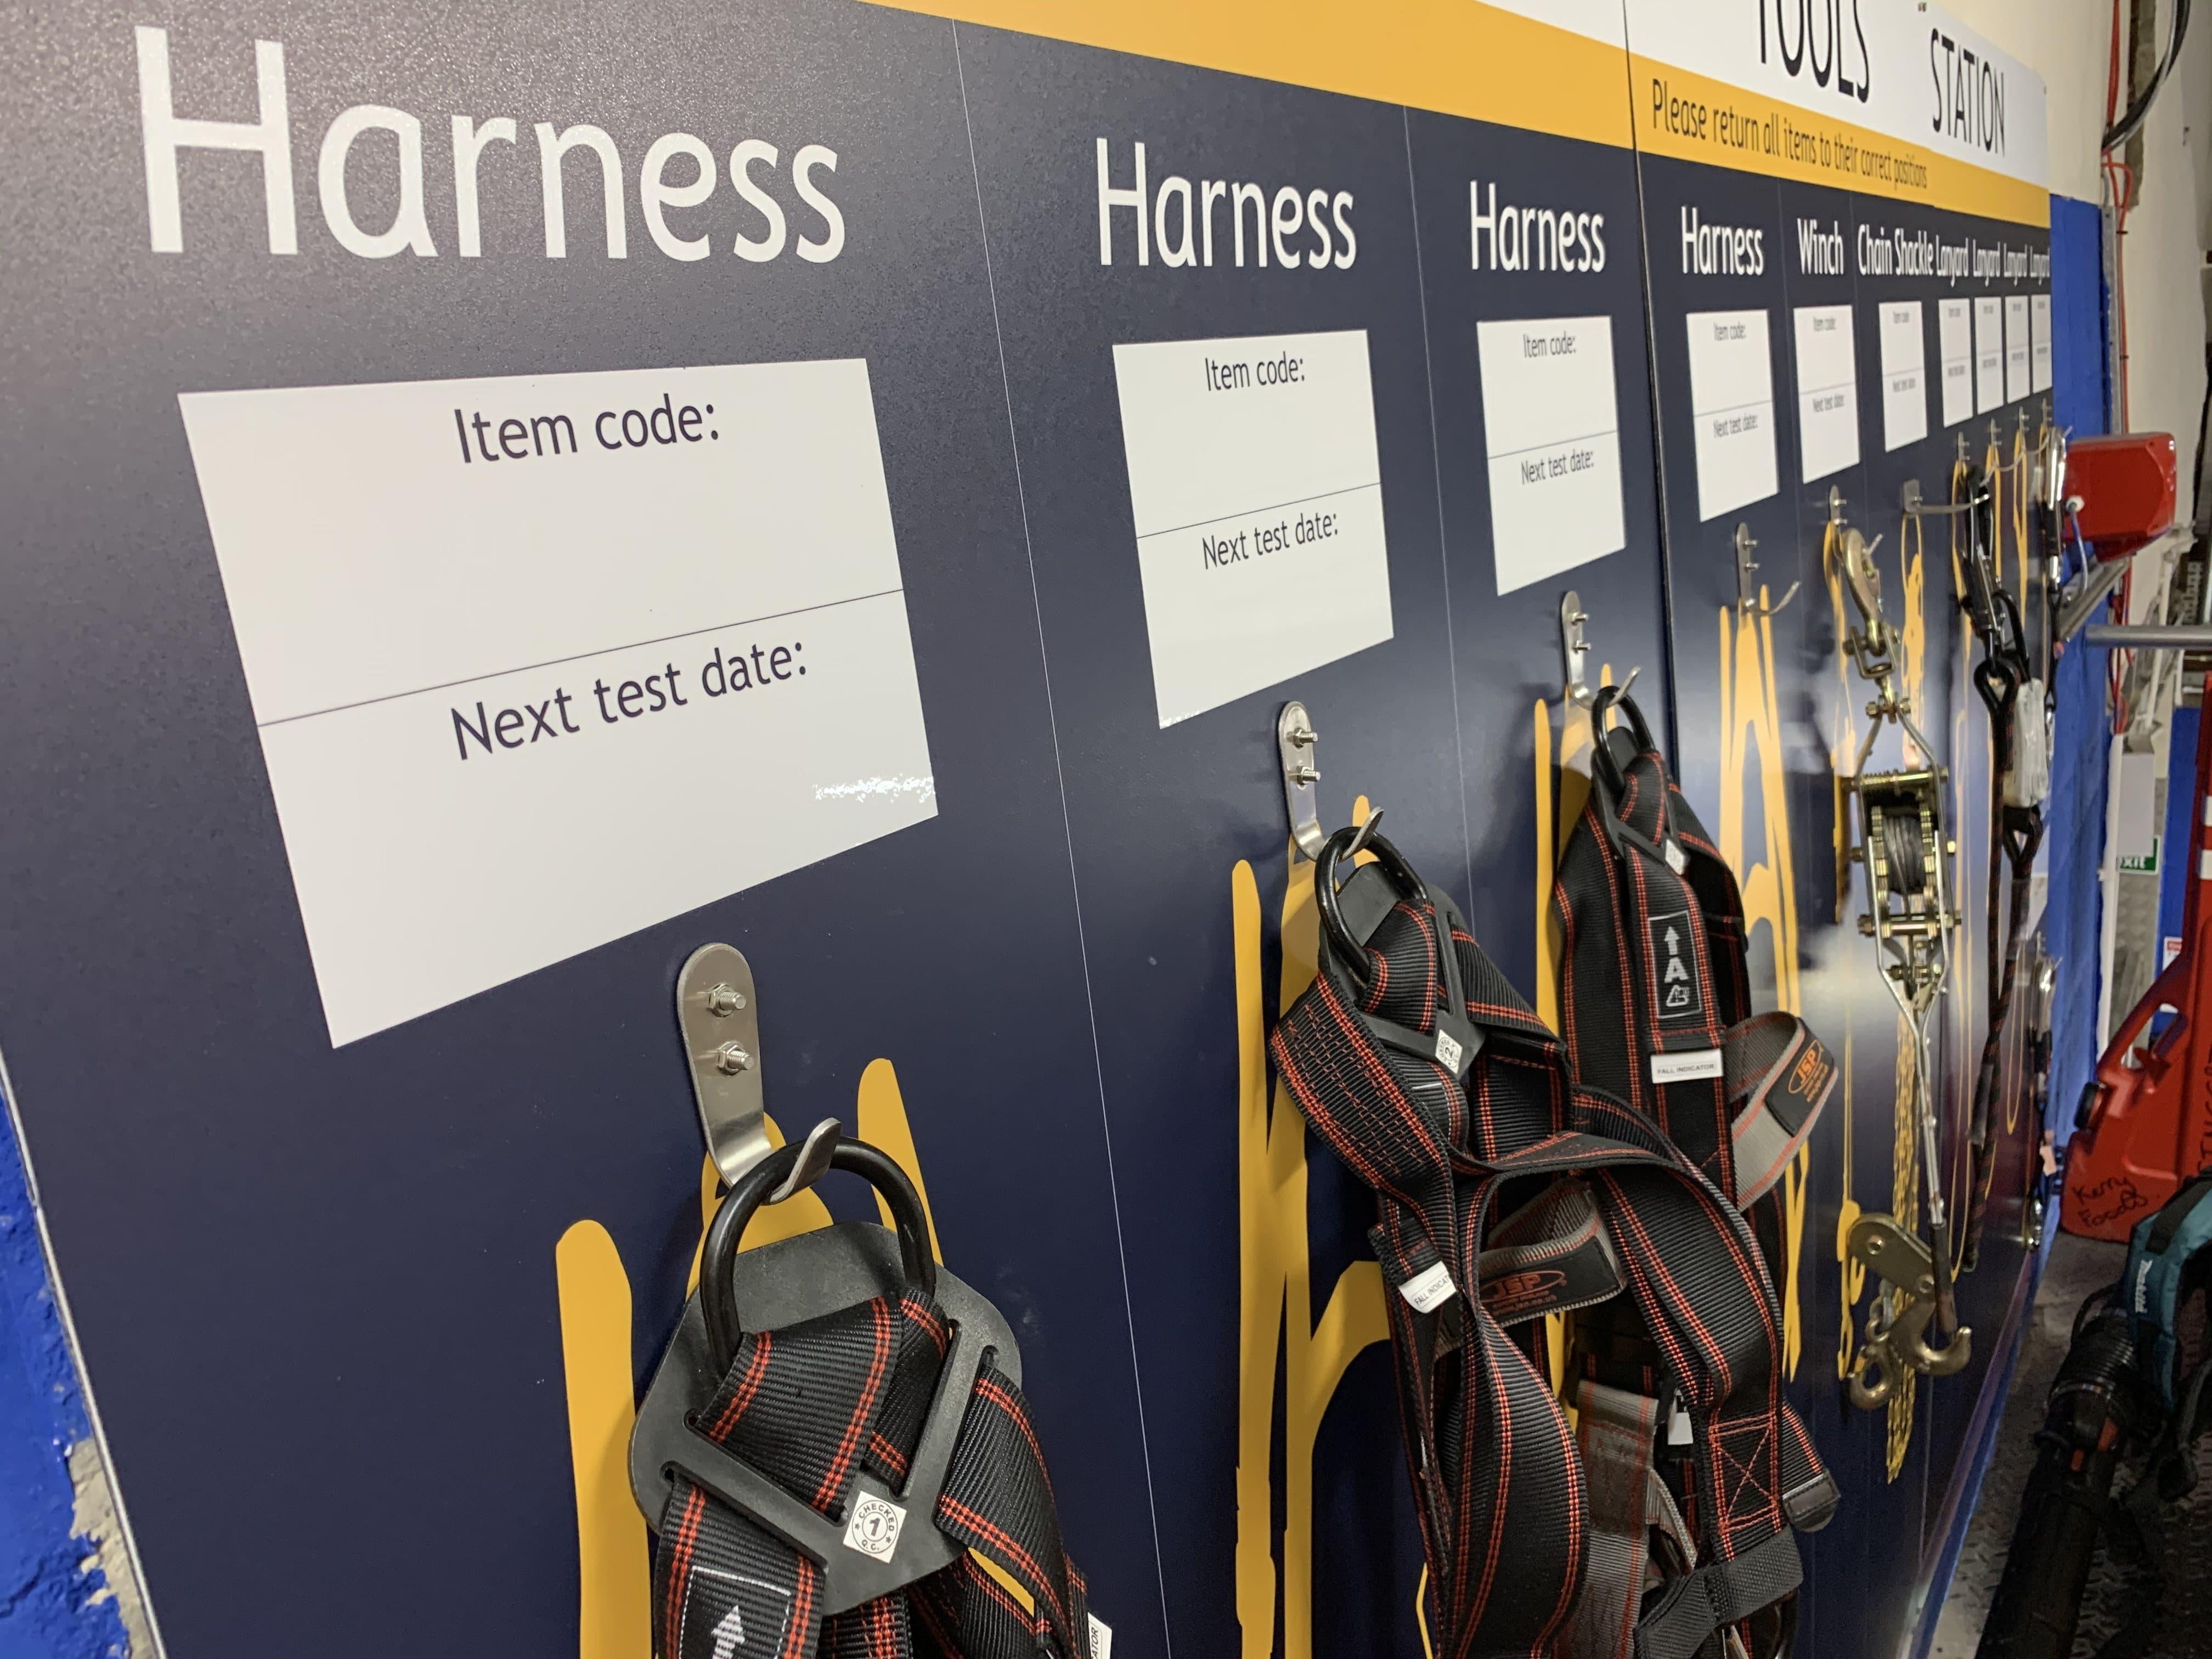 Tool Shadow Board showing Harness Hooks